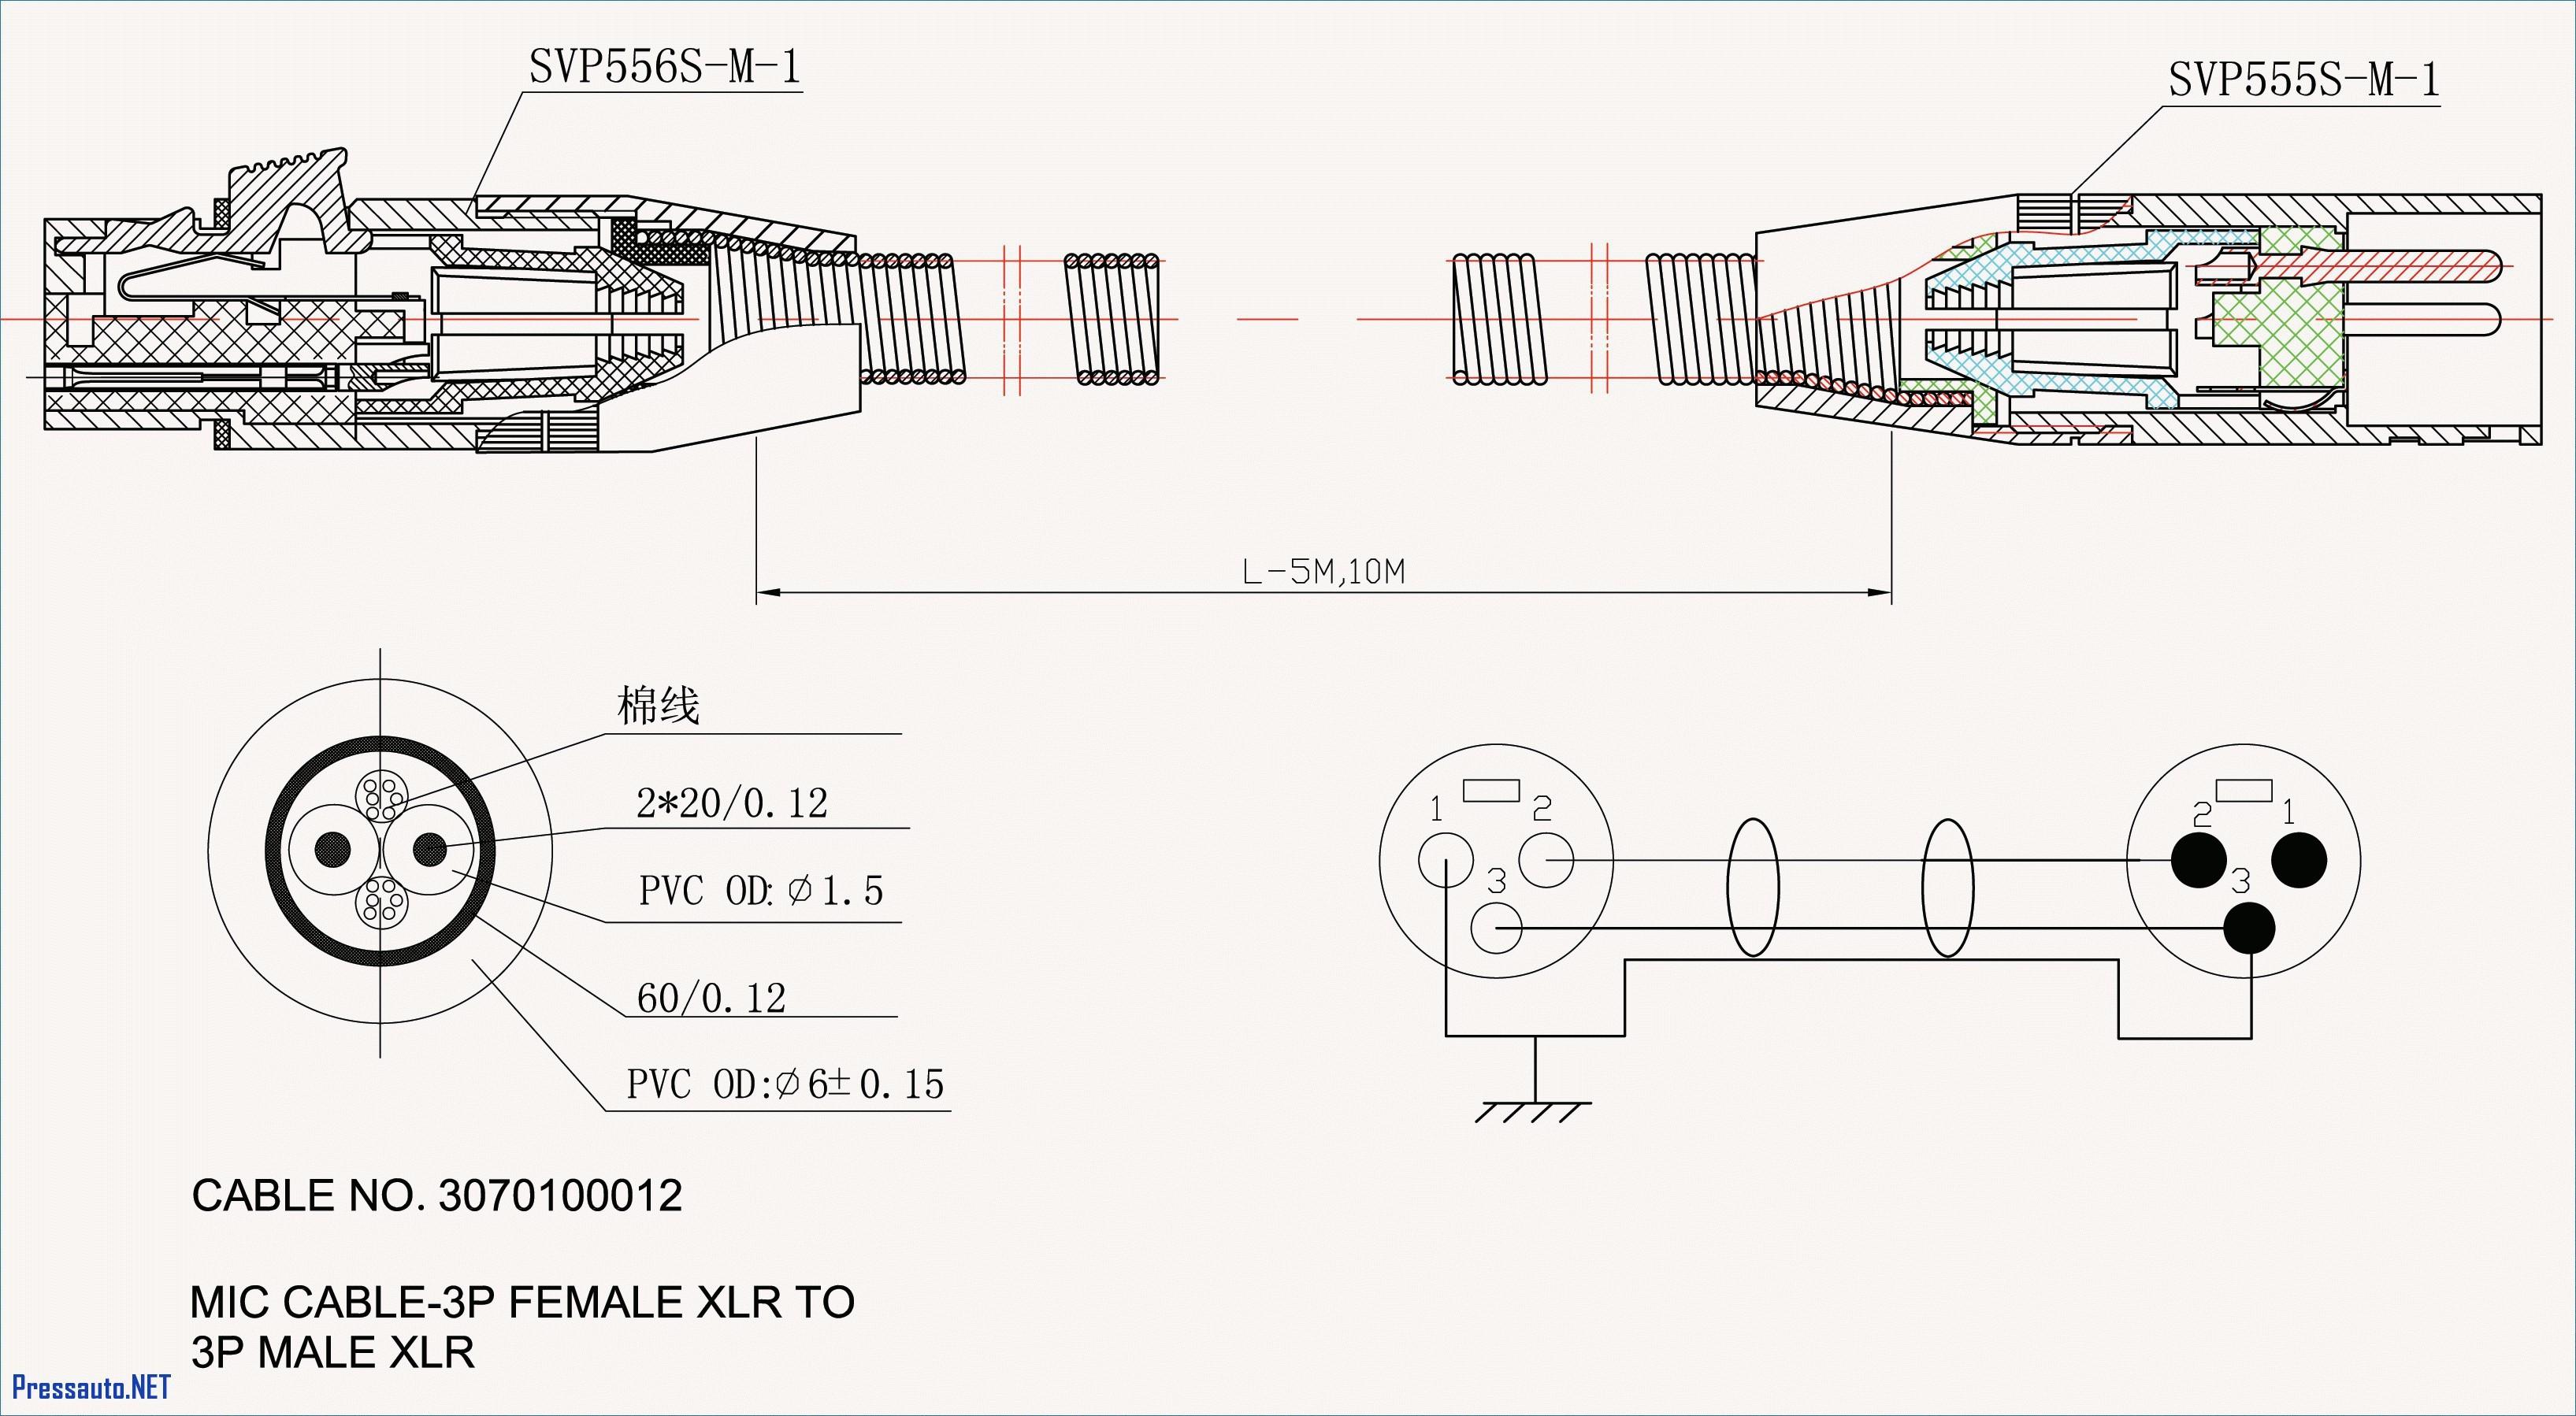 99 s10 wiring diagram plow truck